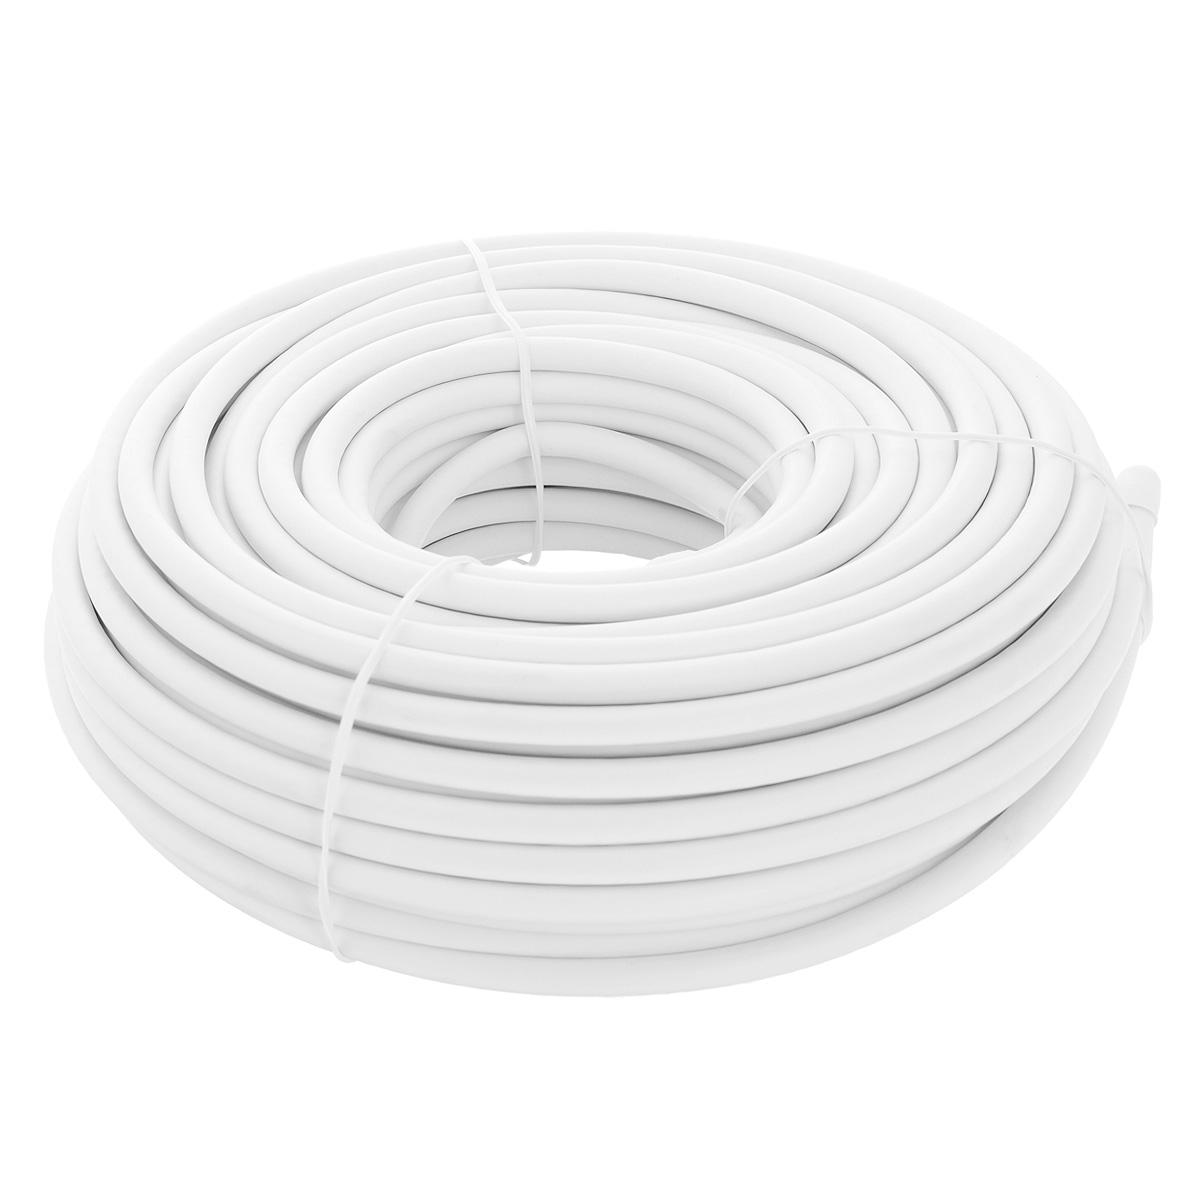 Vivanco Promo Stick кабель антенный, 30 м vivanco 42955